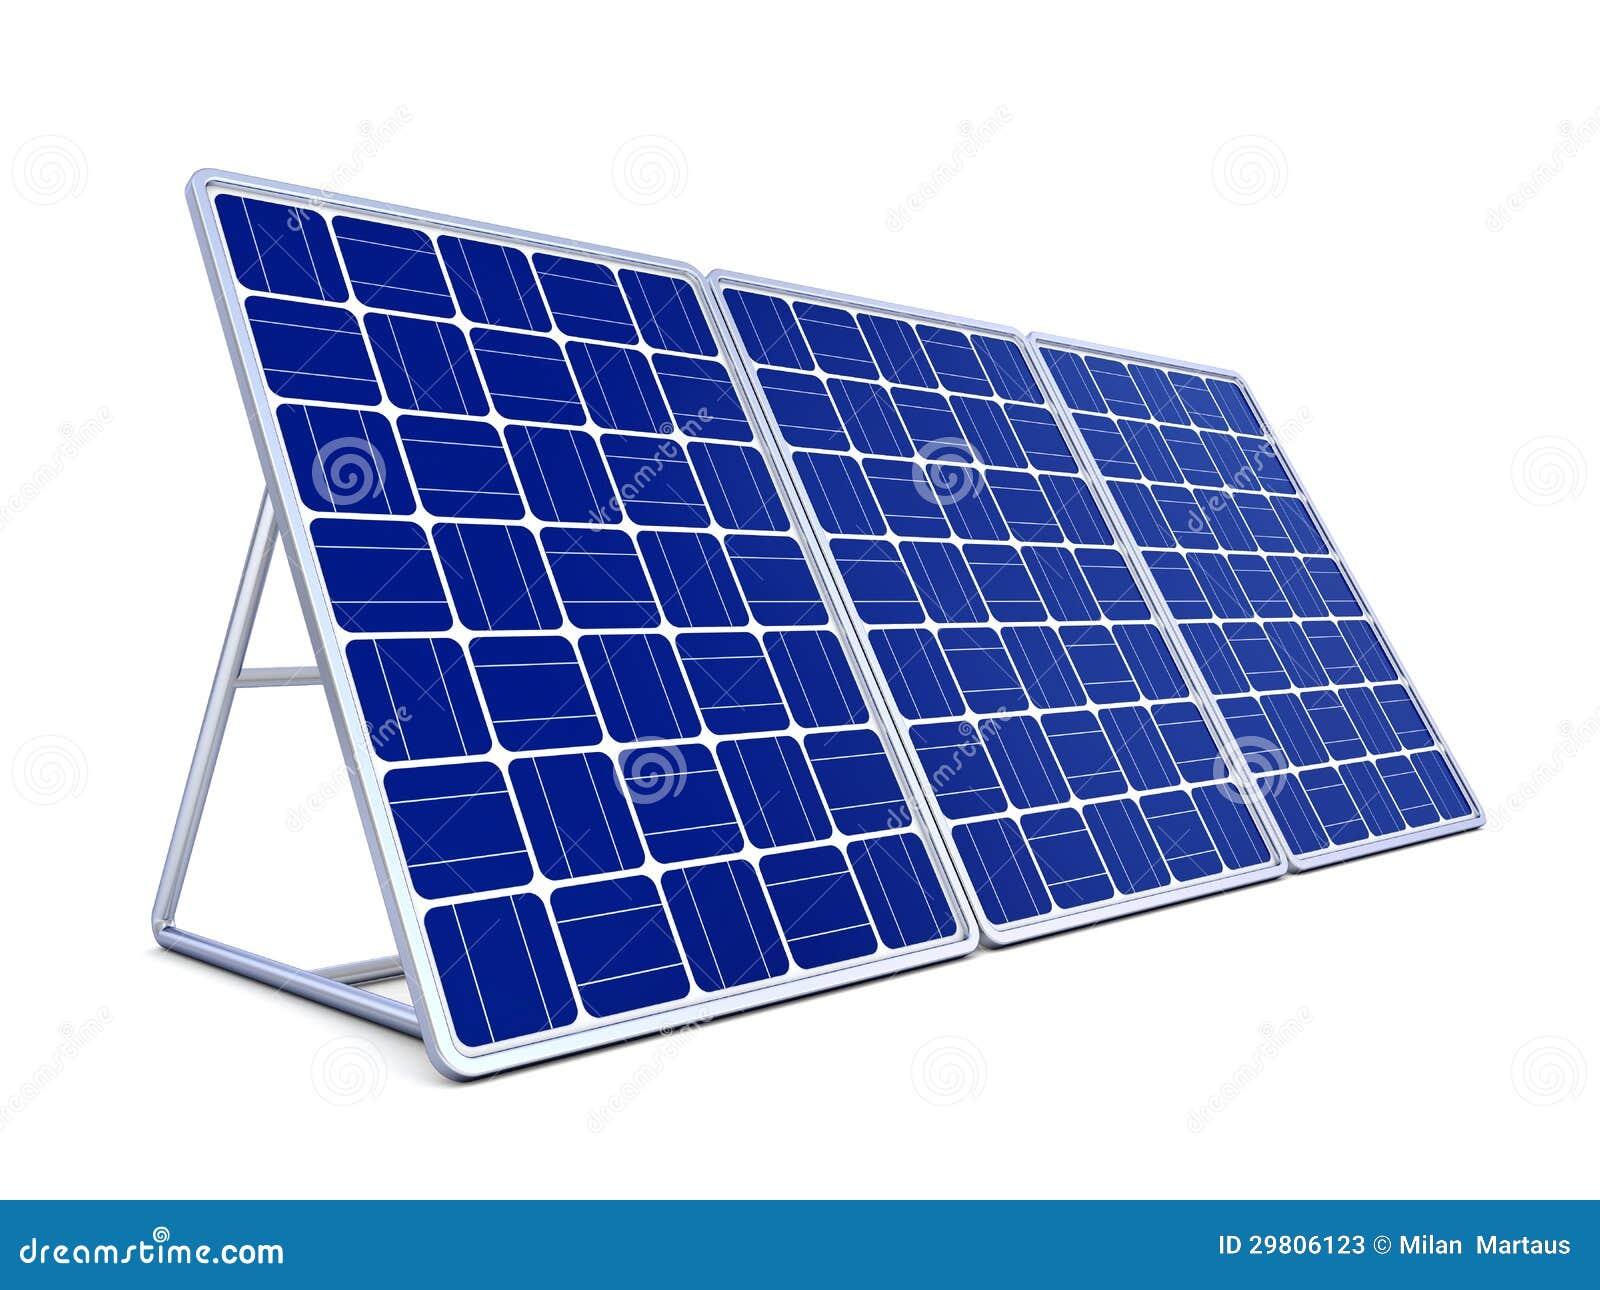 solar panel background - photo #35